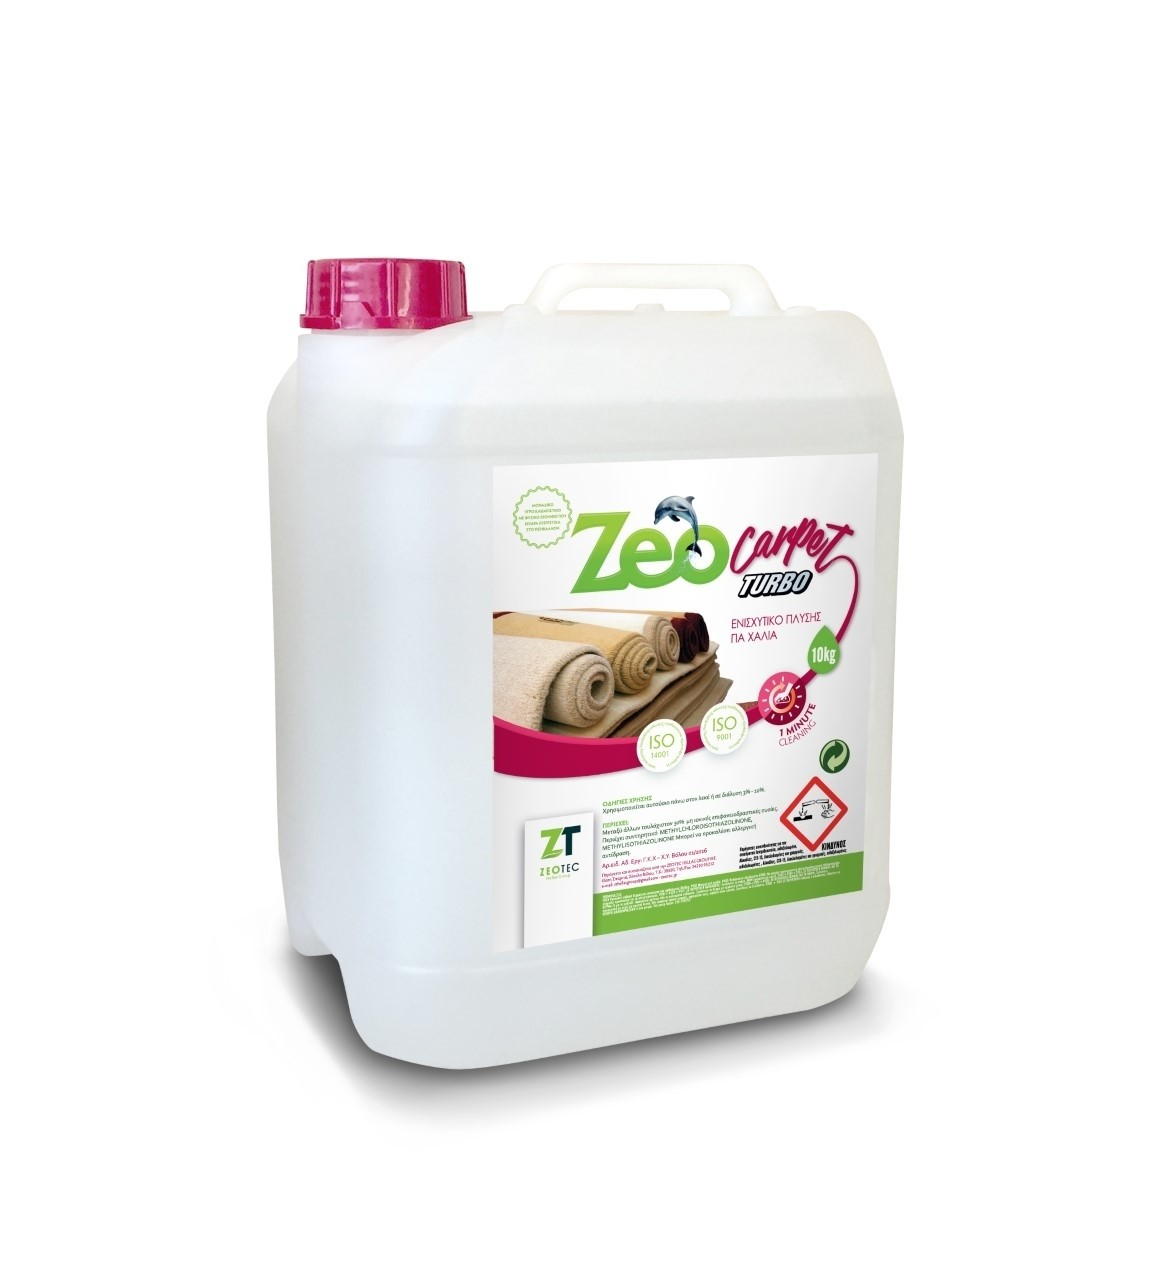 Zeo Carpet Turbo - Ενισχυμένο υγρό πλυντηρίου για χαλιά και μοκέτες 20lt